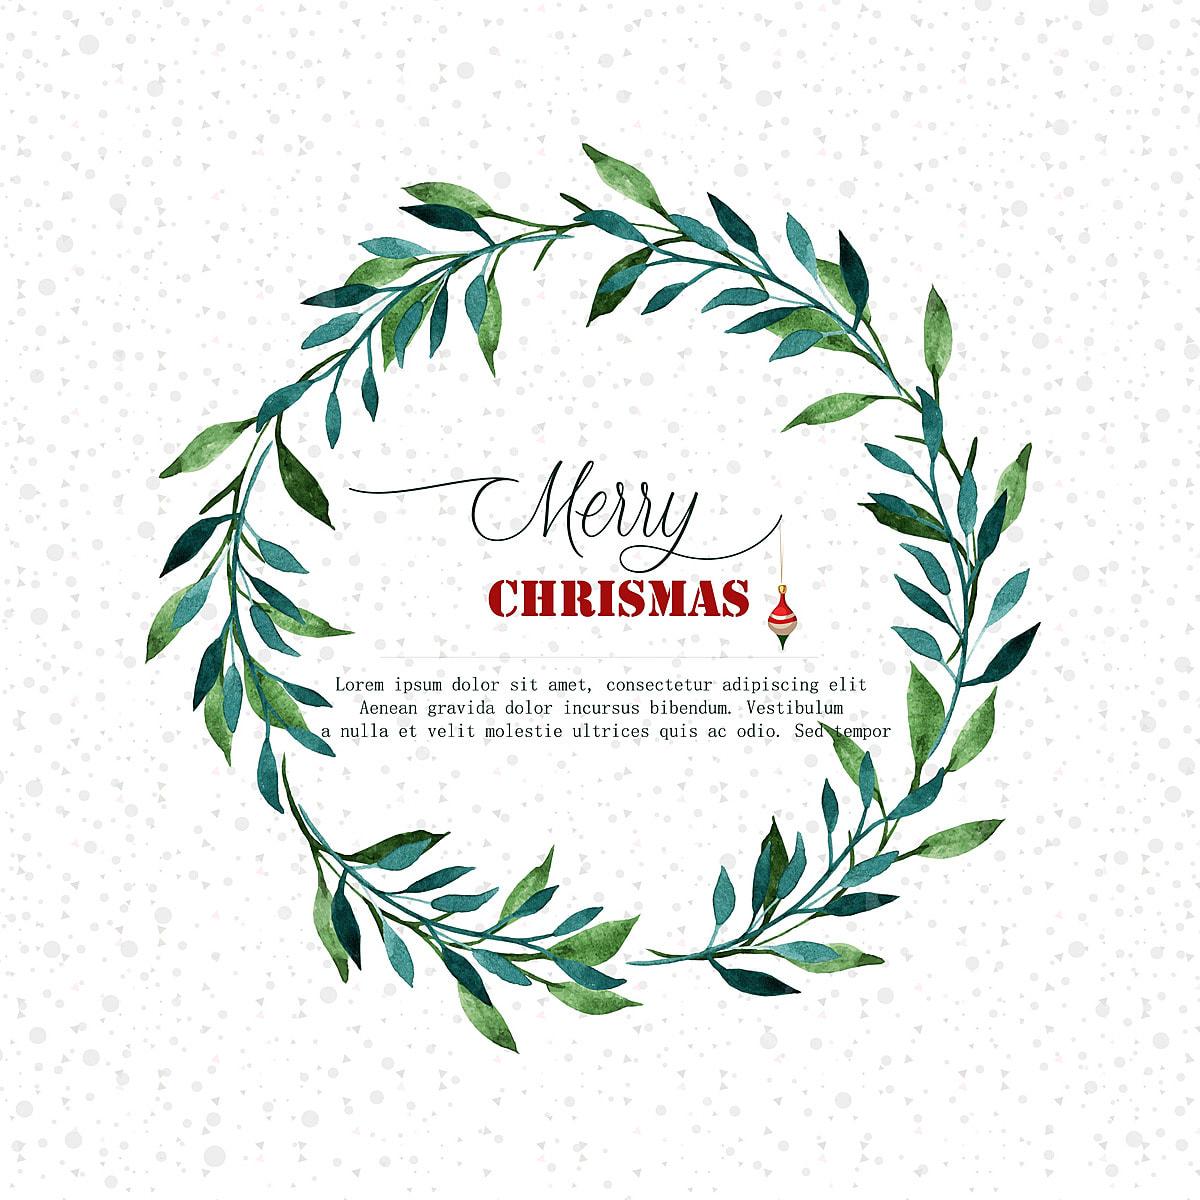 Watercolor Christmas Wreath Png.Watercolor Christmas Wreath Christmas Background